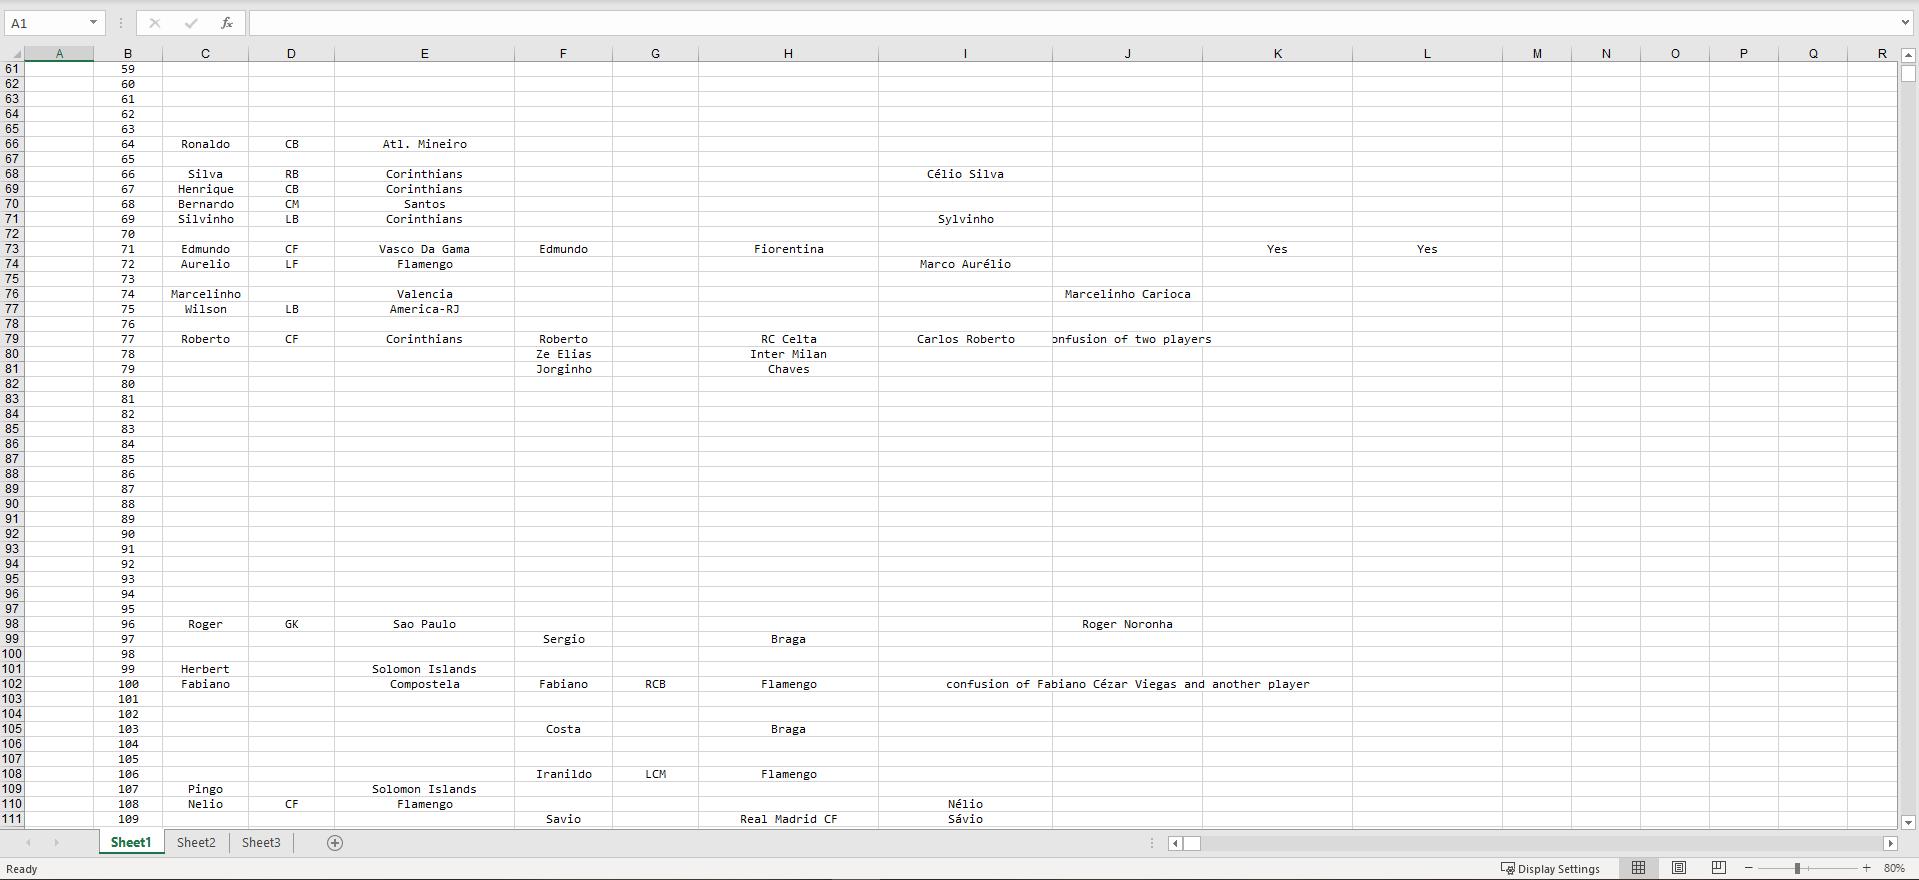 FIFA98‒99 player database